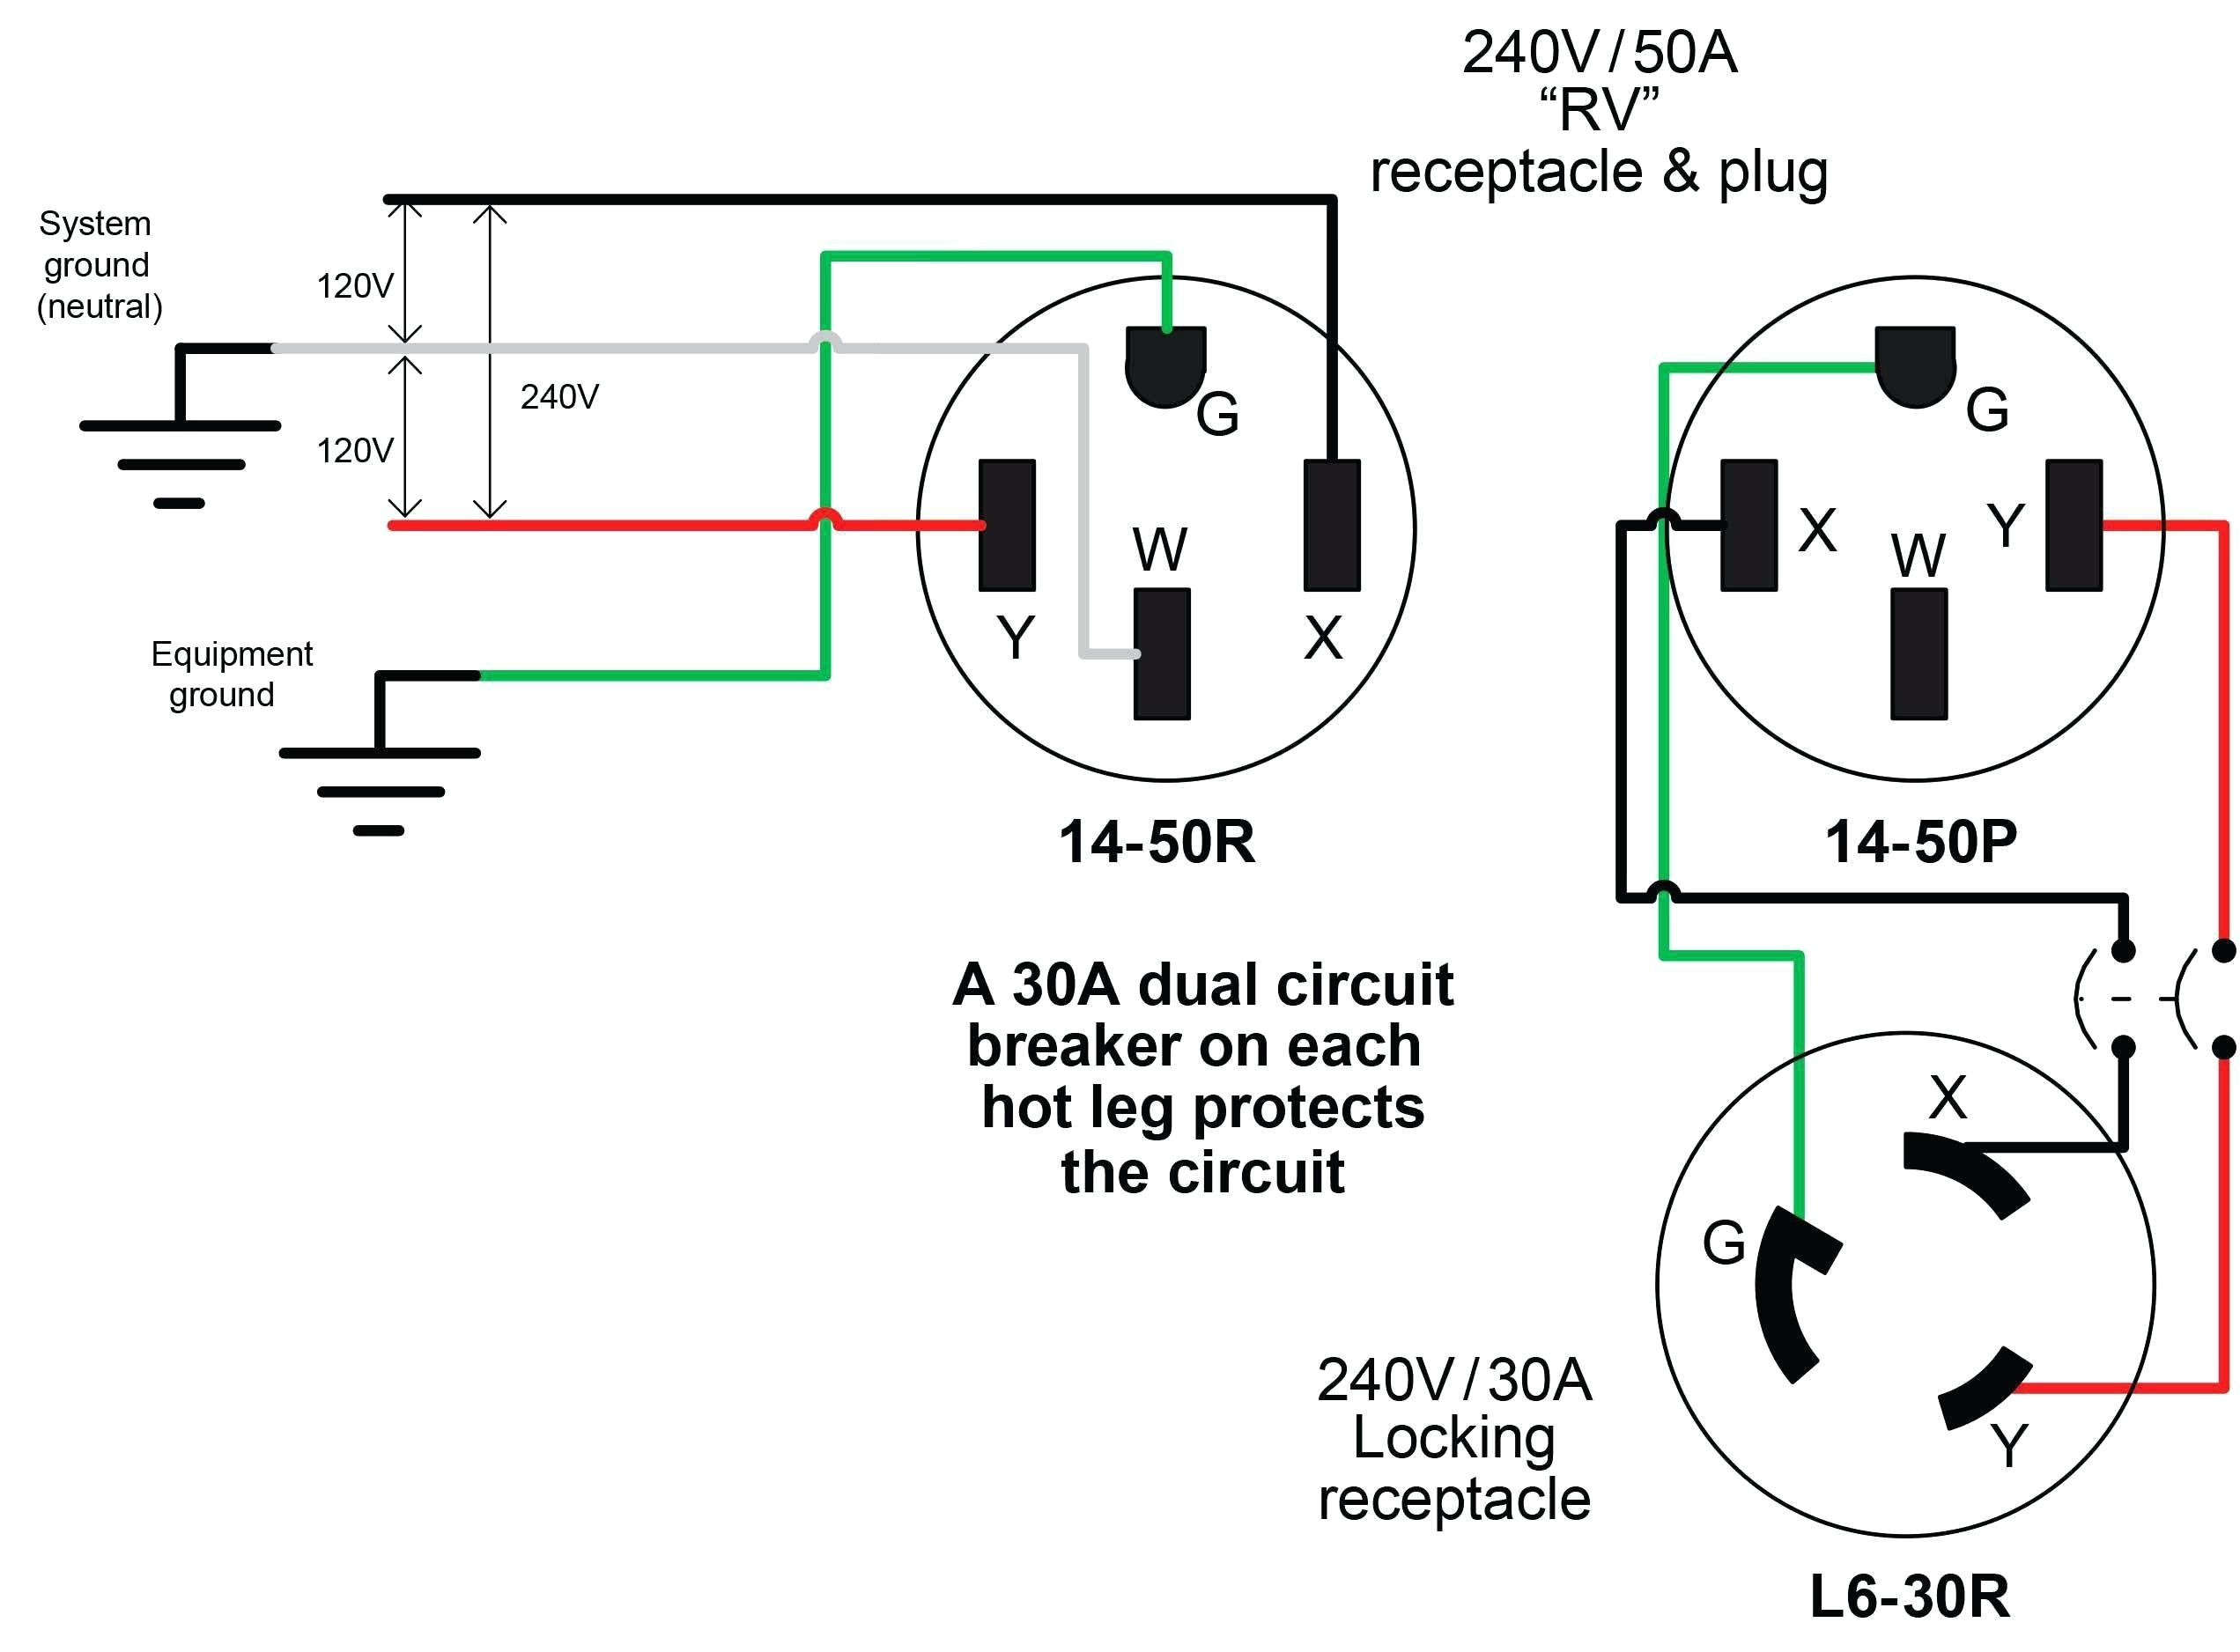 30 Amp Breaker Wiring Diagram Wiring Diagram for 220 Volt Generator Plug Outlet Wiring